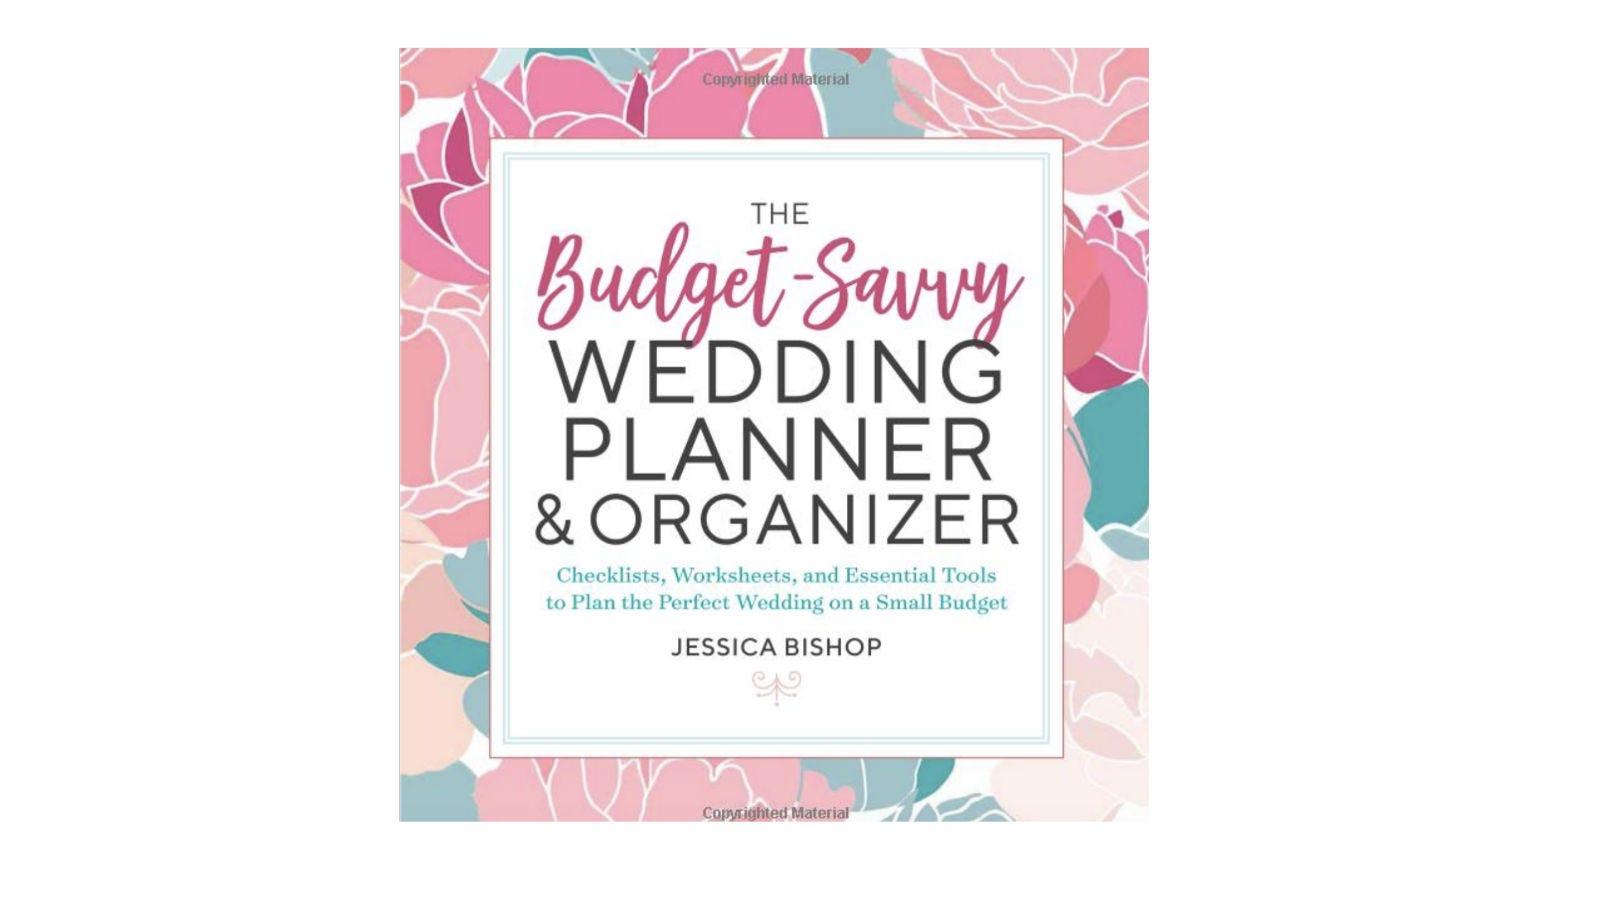 The Budget-Savvy Wedding Planner and Organizer